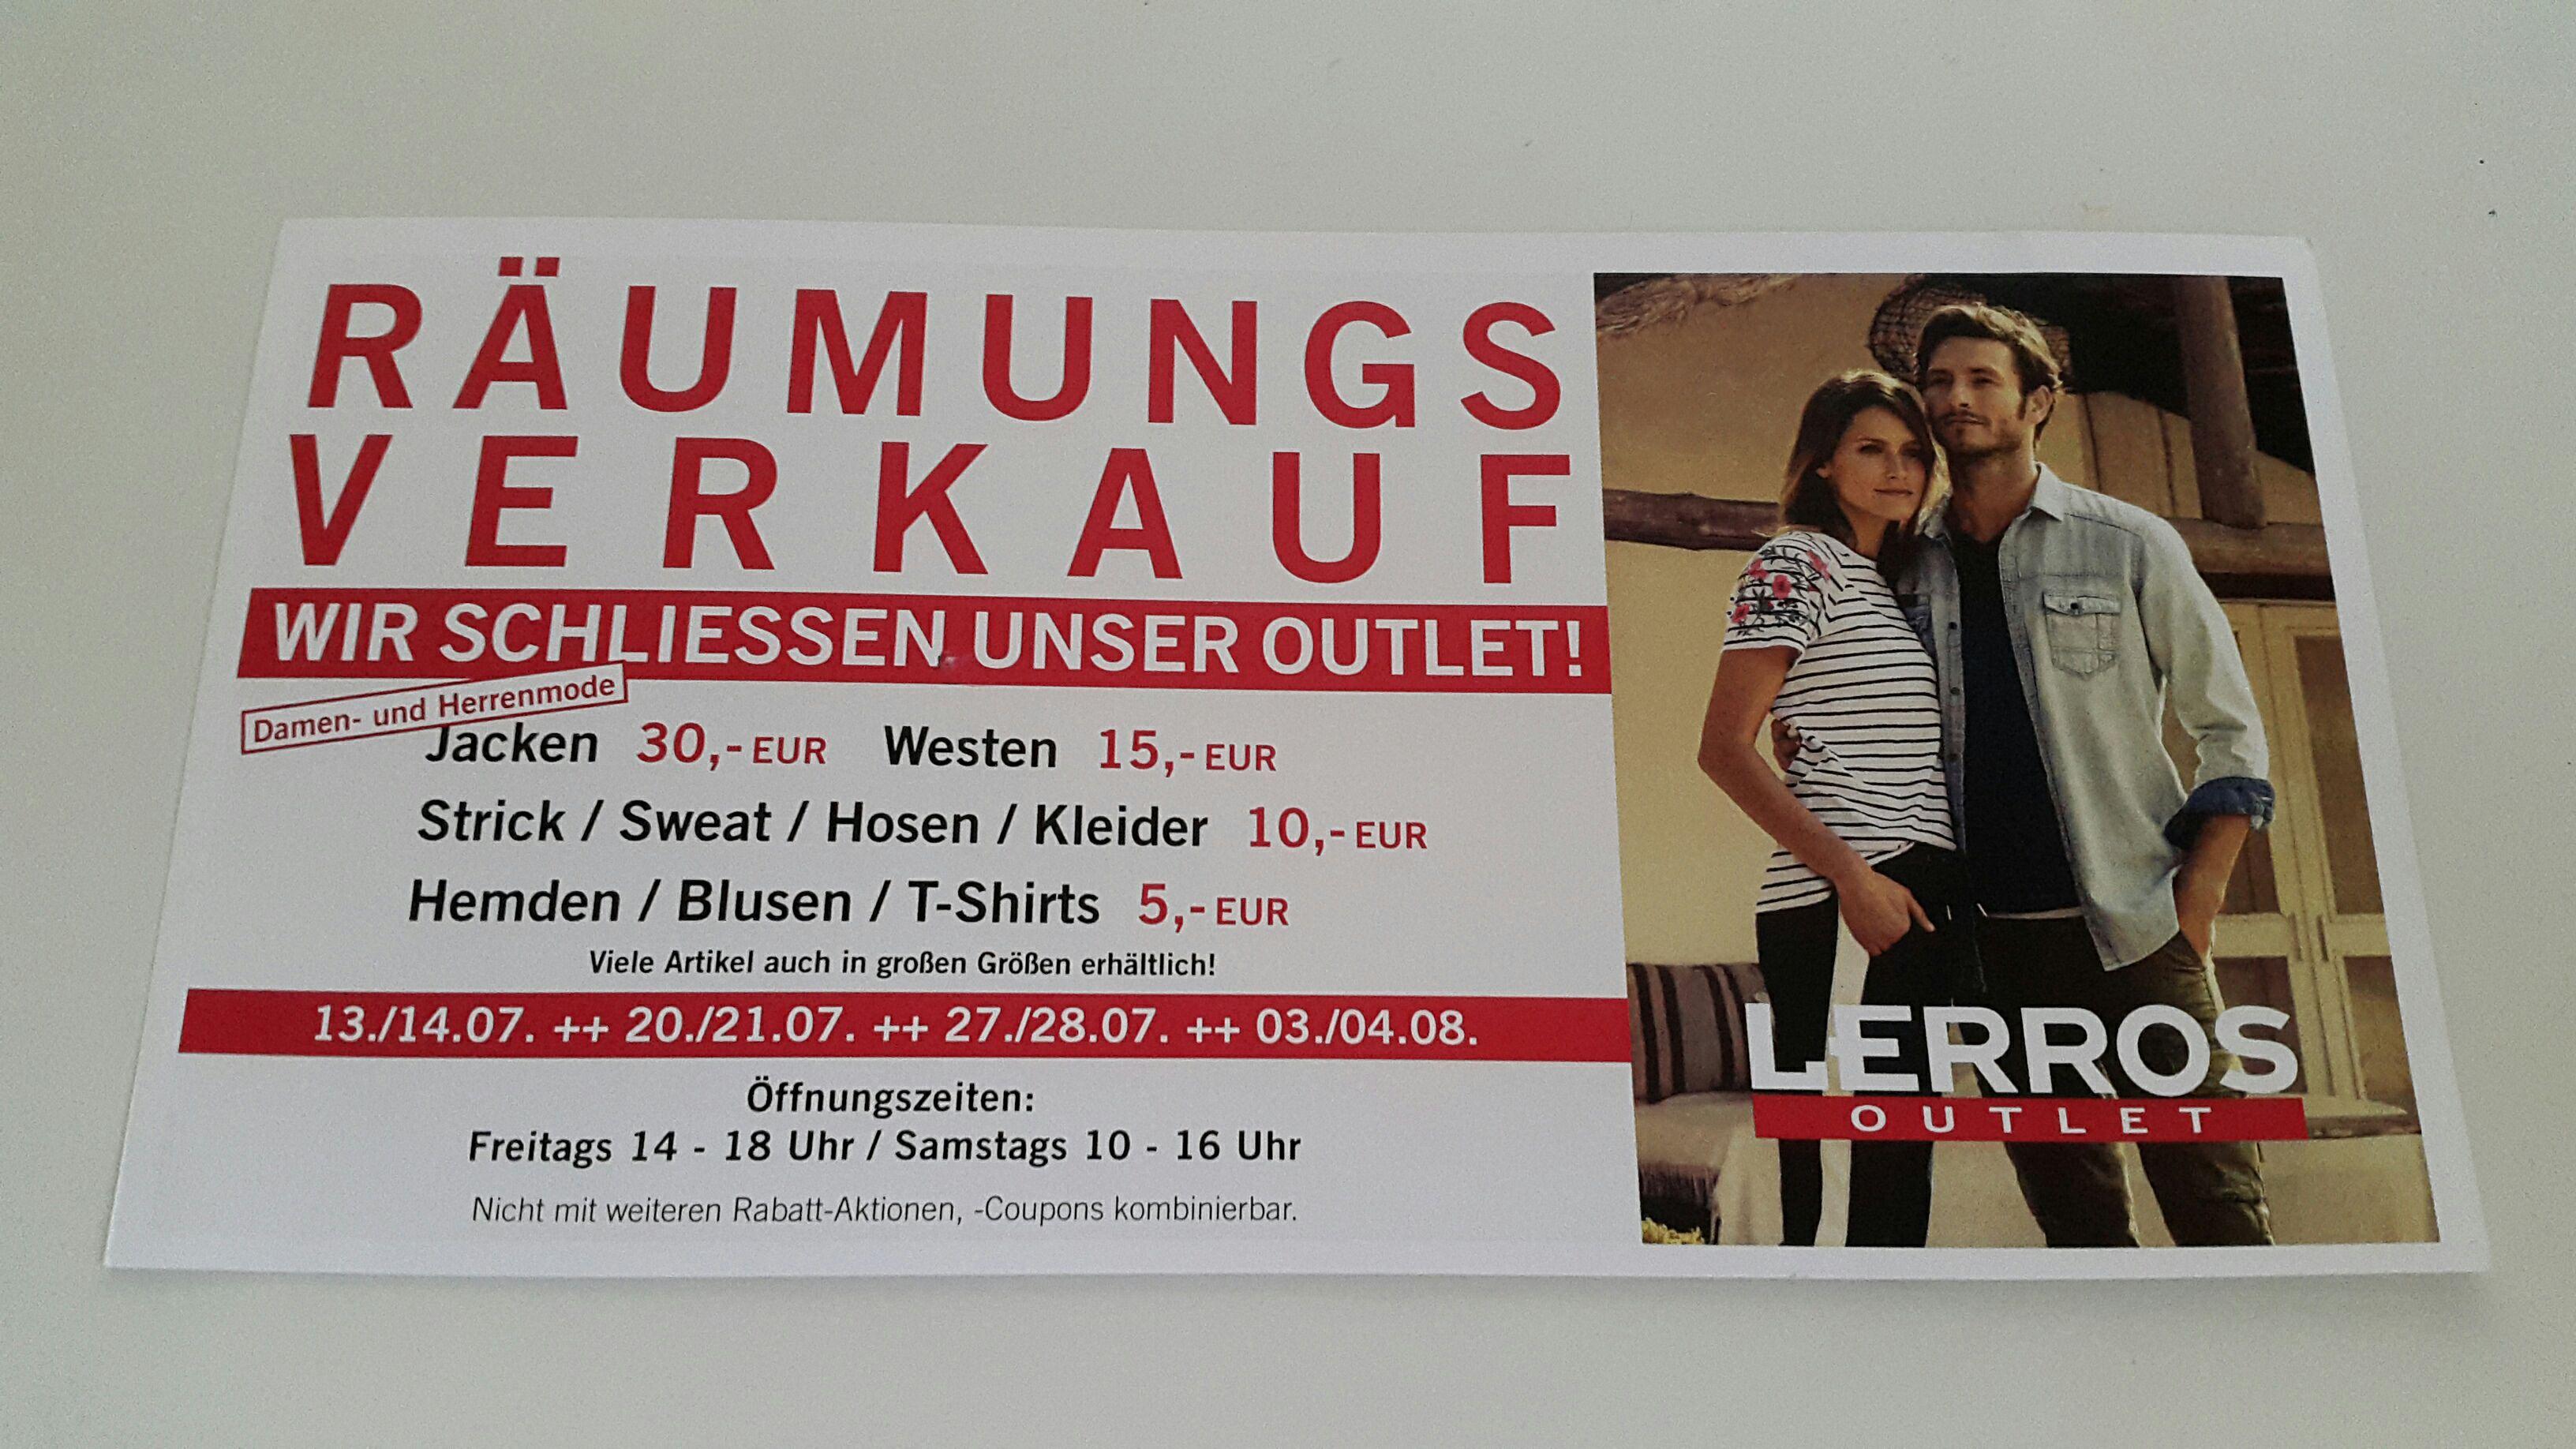 [Lokal] Lerros Outlet Neuss, Räumungsverkauf: alle Hosen/Kleider 10€, Hemden/Blusen 5€ uvm [Neuss, Düsseldorf, Köln, Duisburg, Mönchengladbach, Wuppertal und Umgebung]